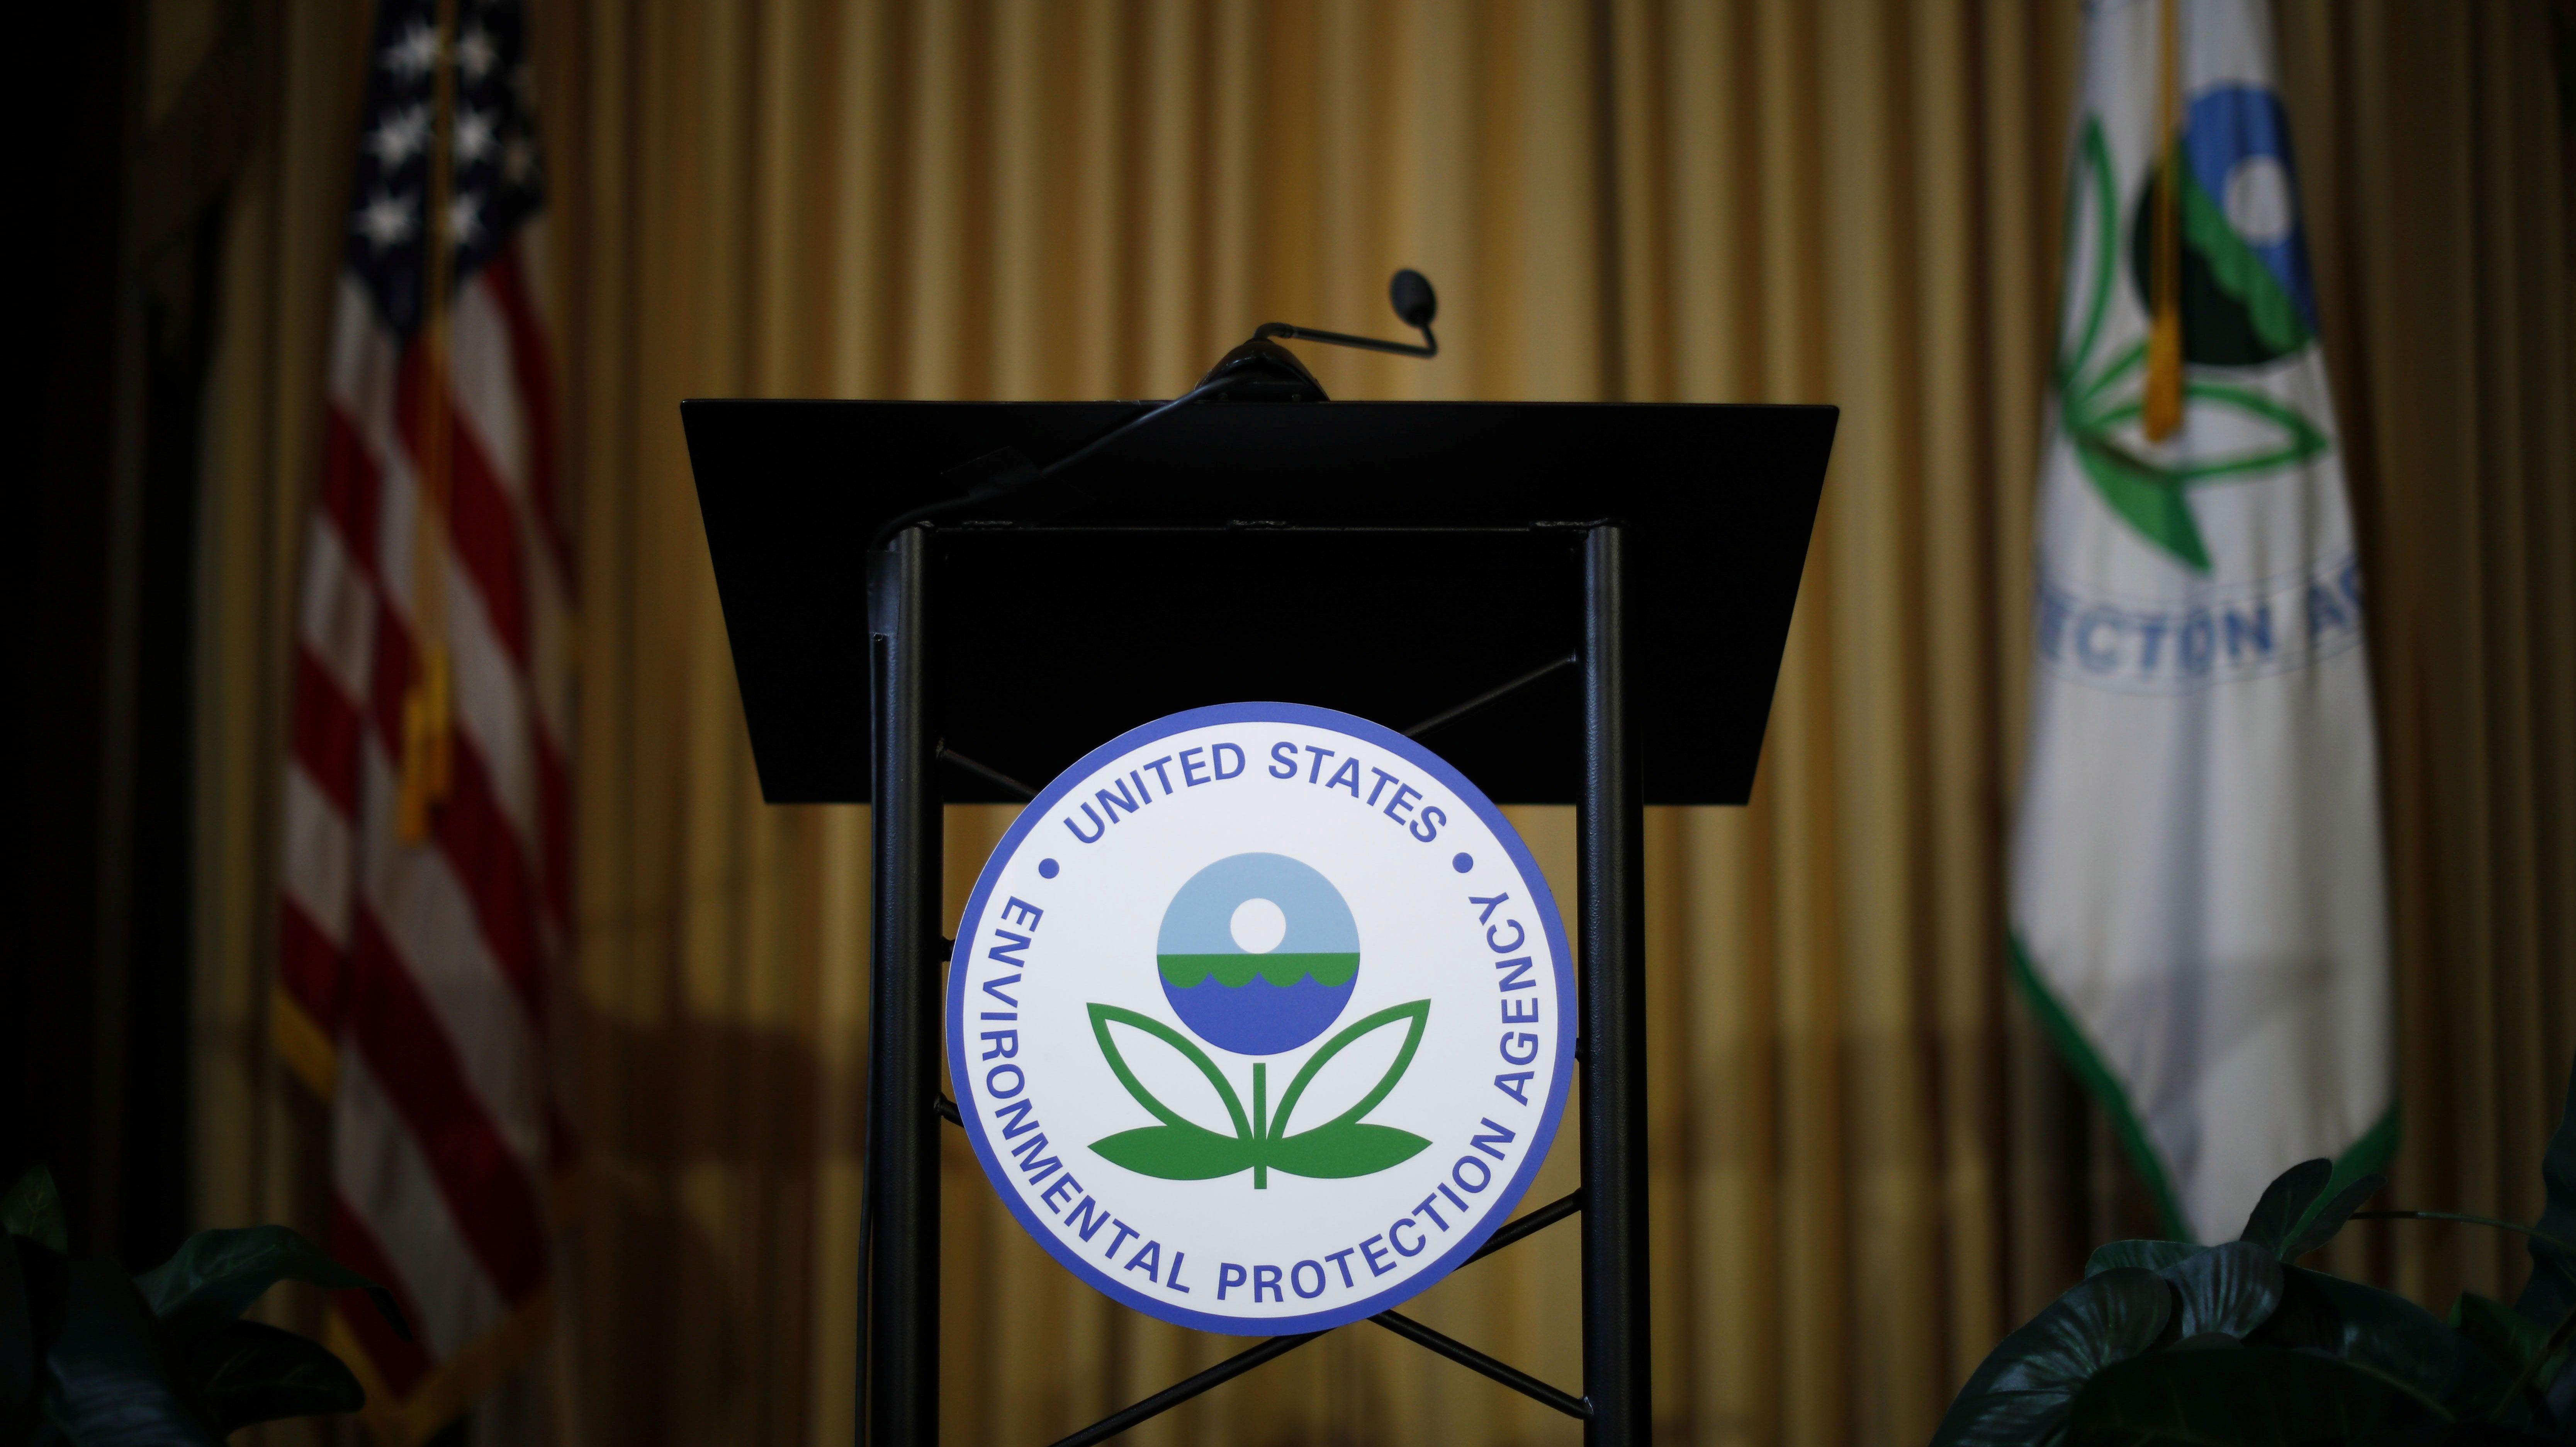 EPA staffers destroyed files under audit